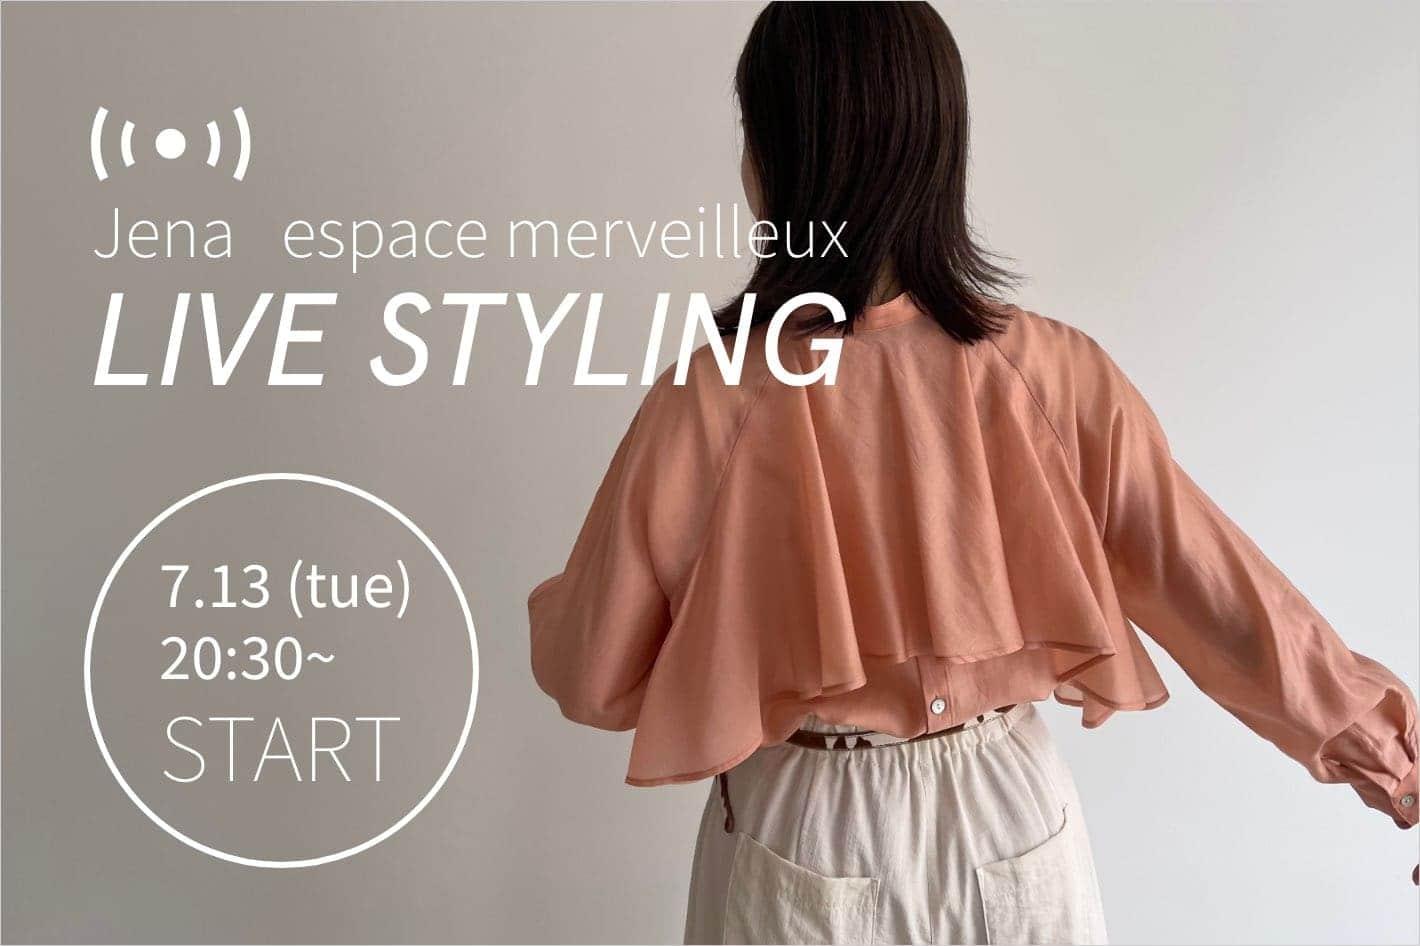 Jena espace merveilleux 【LIVE STYLING】先行販売アイテムのおすすめスタイリングをスタッフがご紹介!